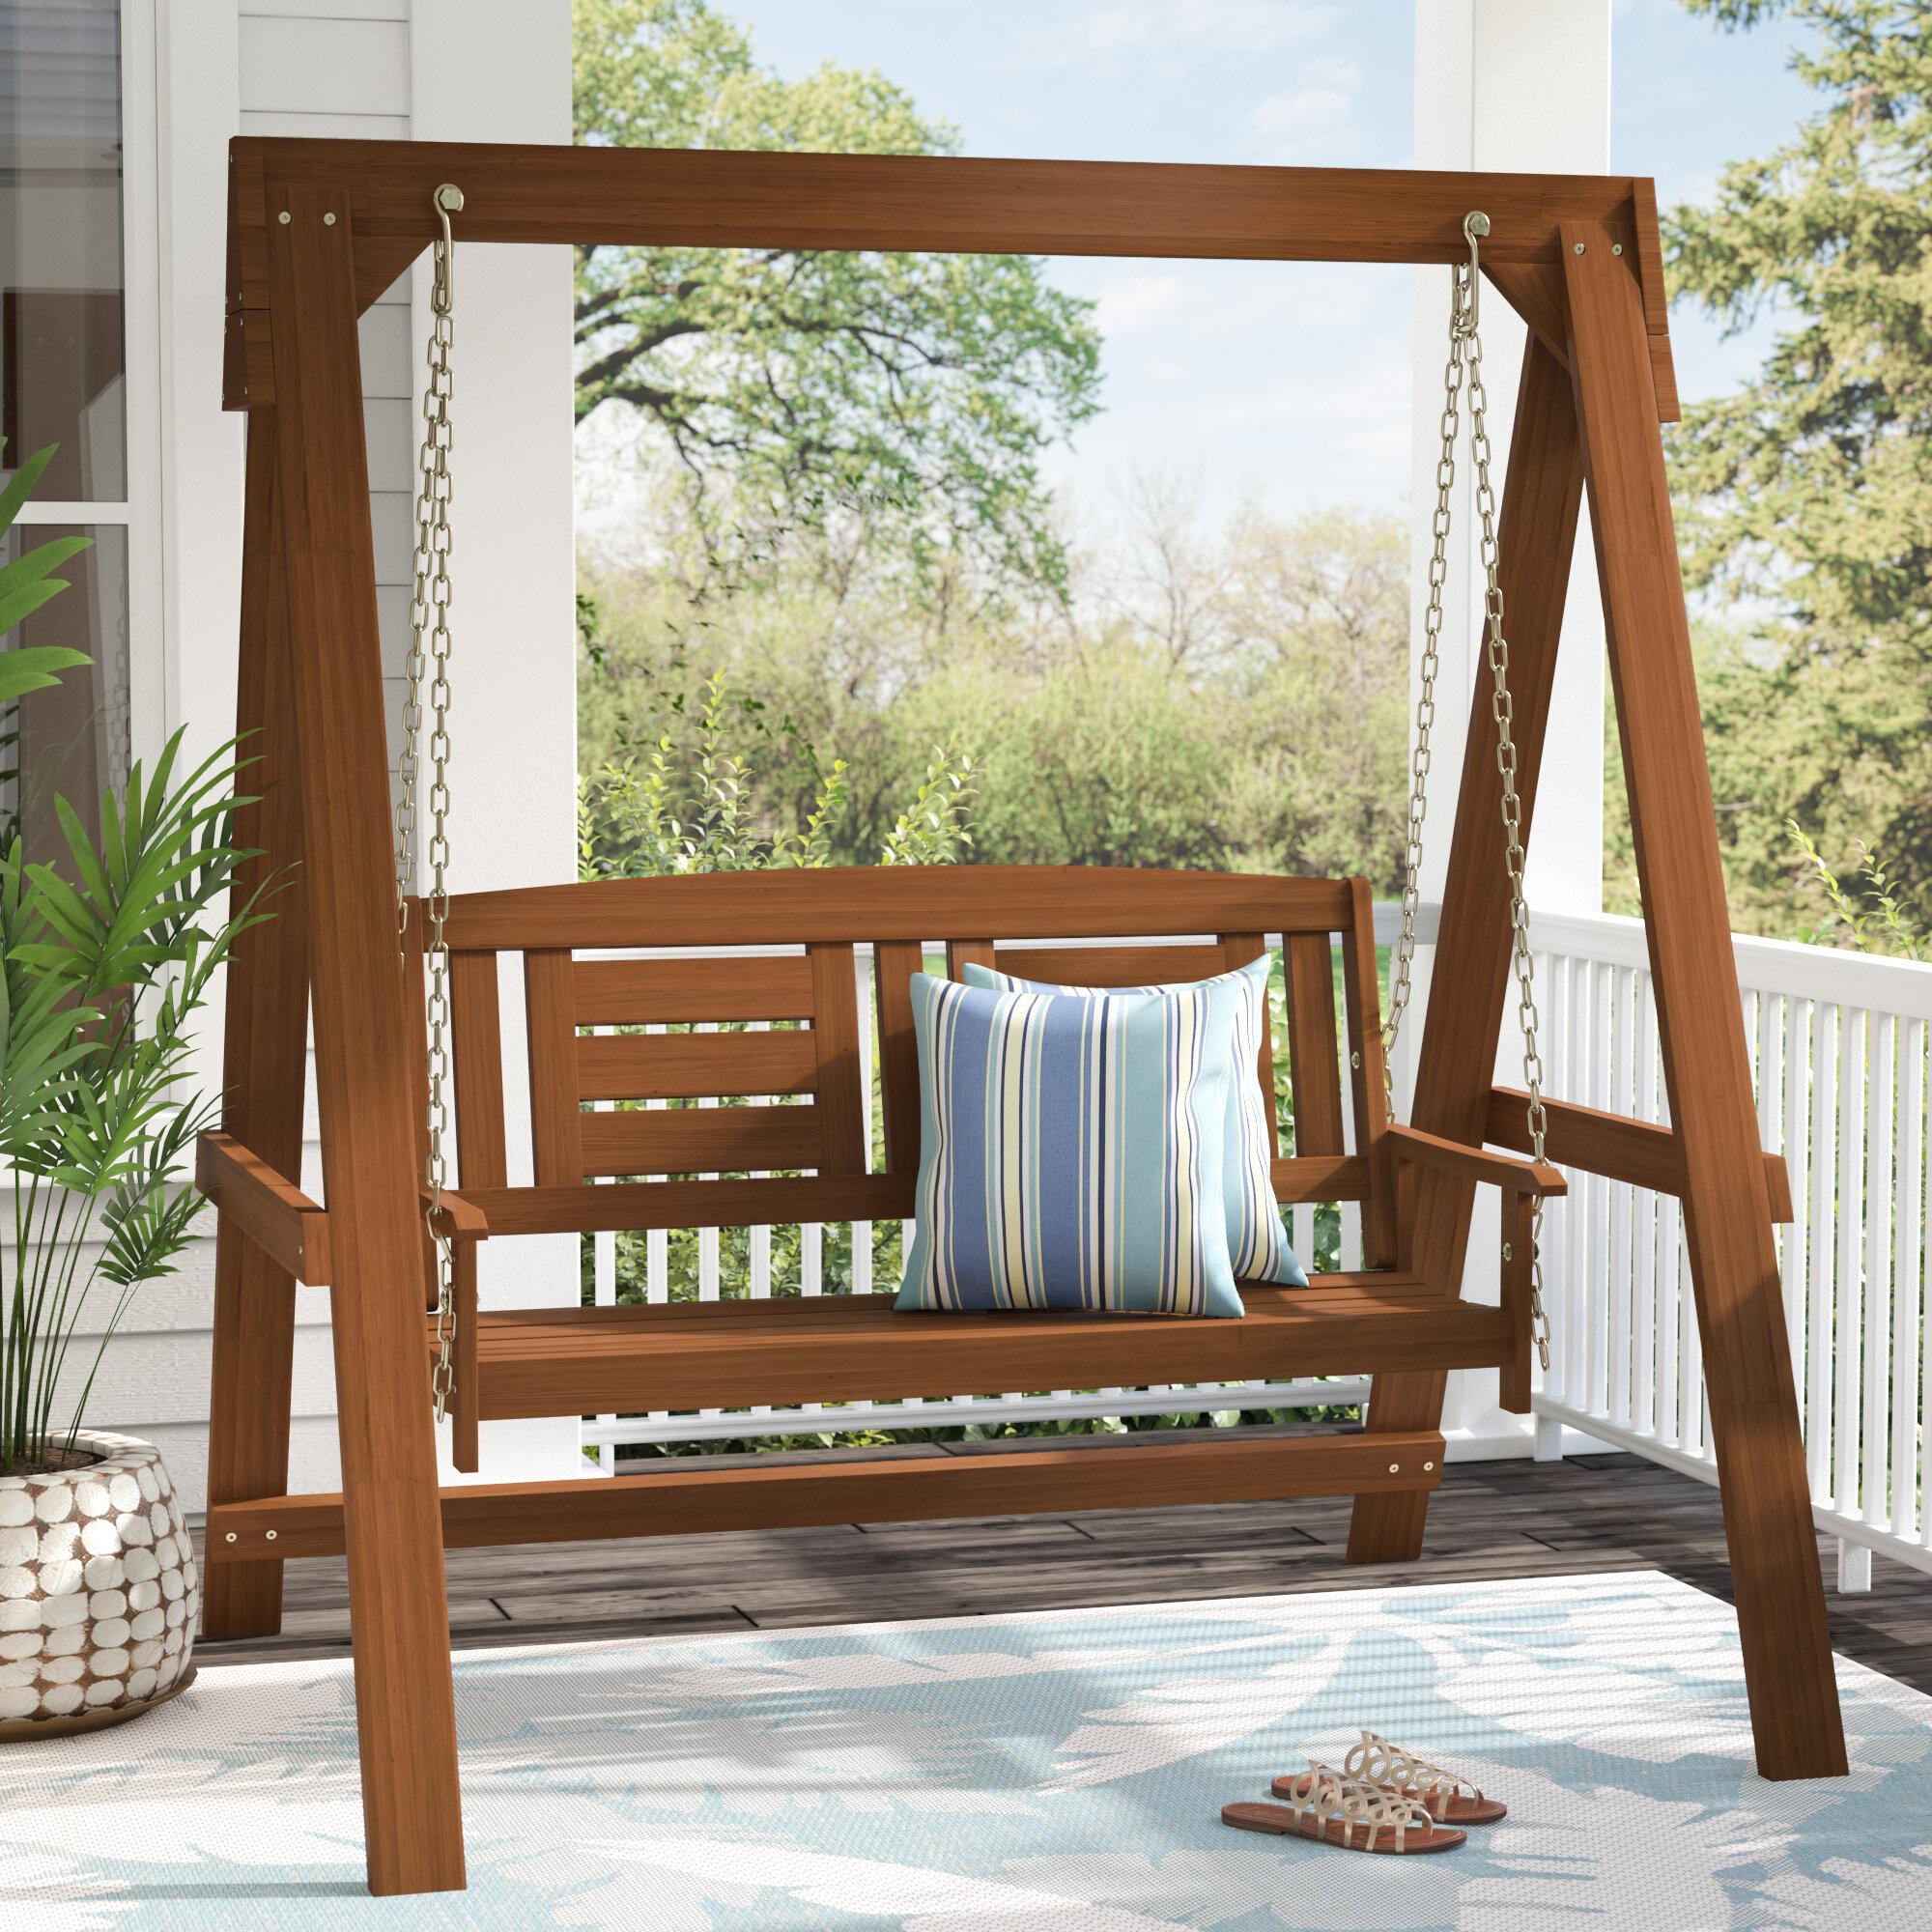 Charming Langley Street Arianna Hardwood Hanging Porch Swing With Stand U0026 Reviews |  Wayfair